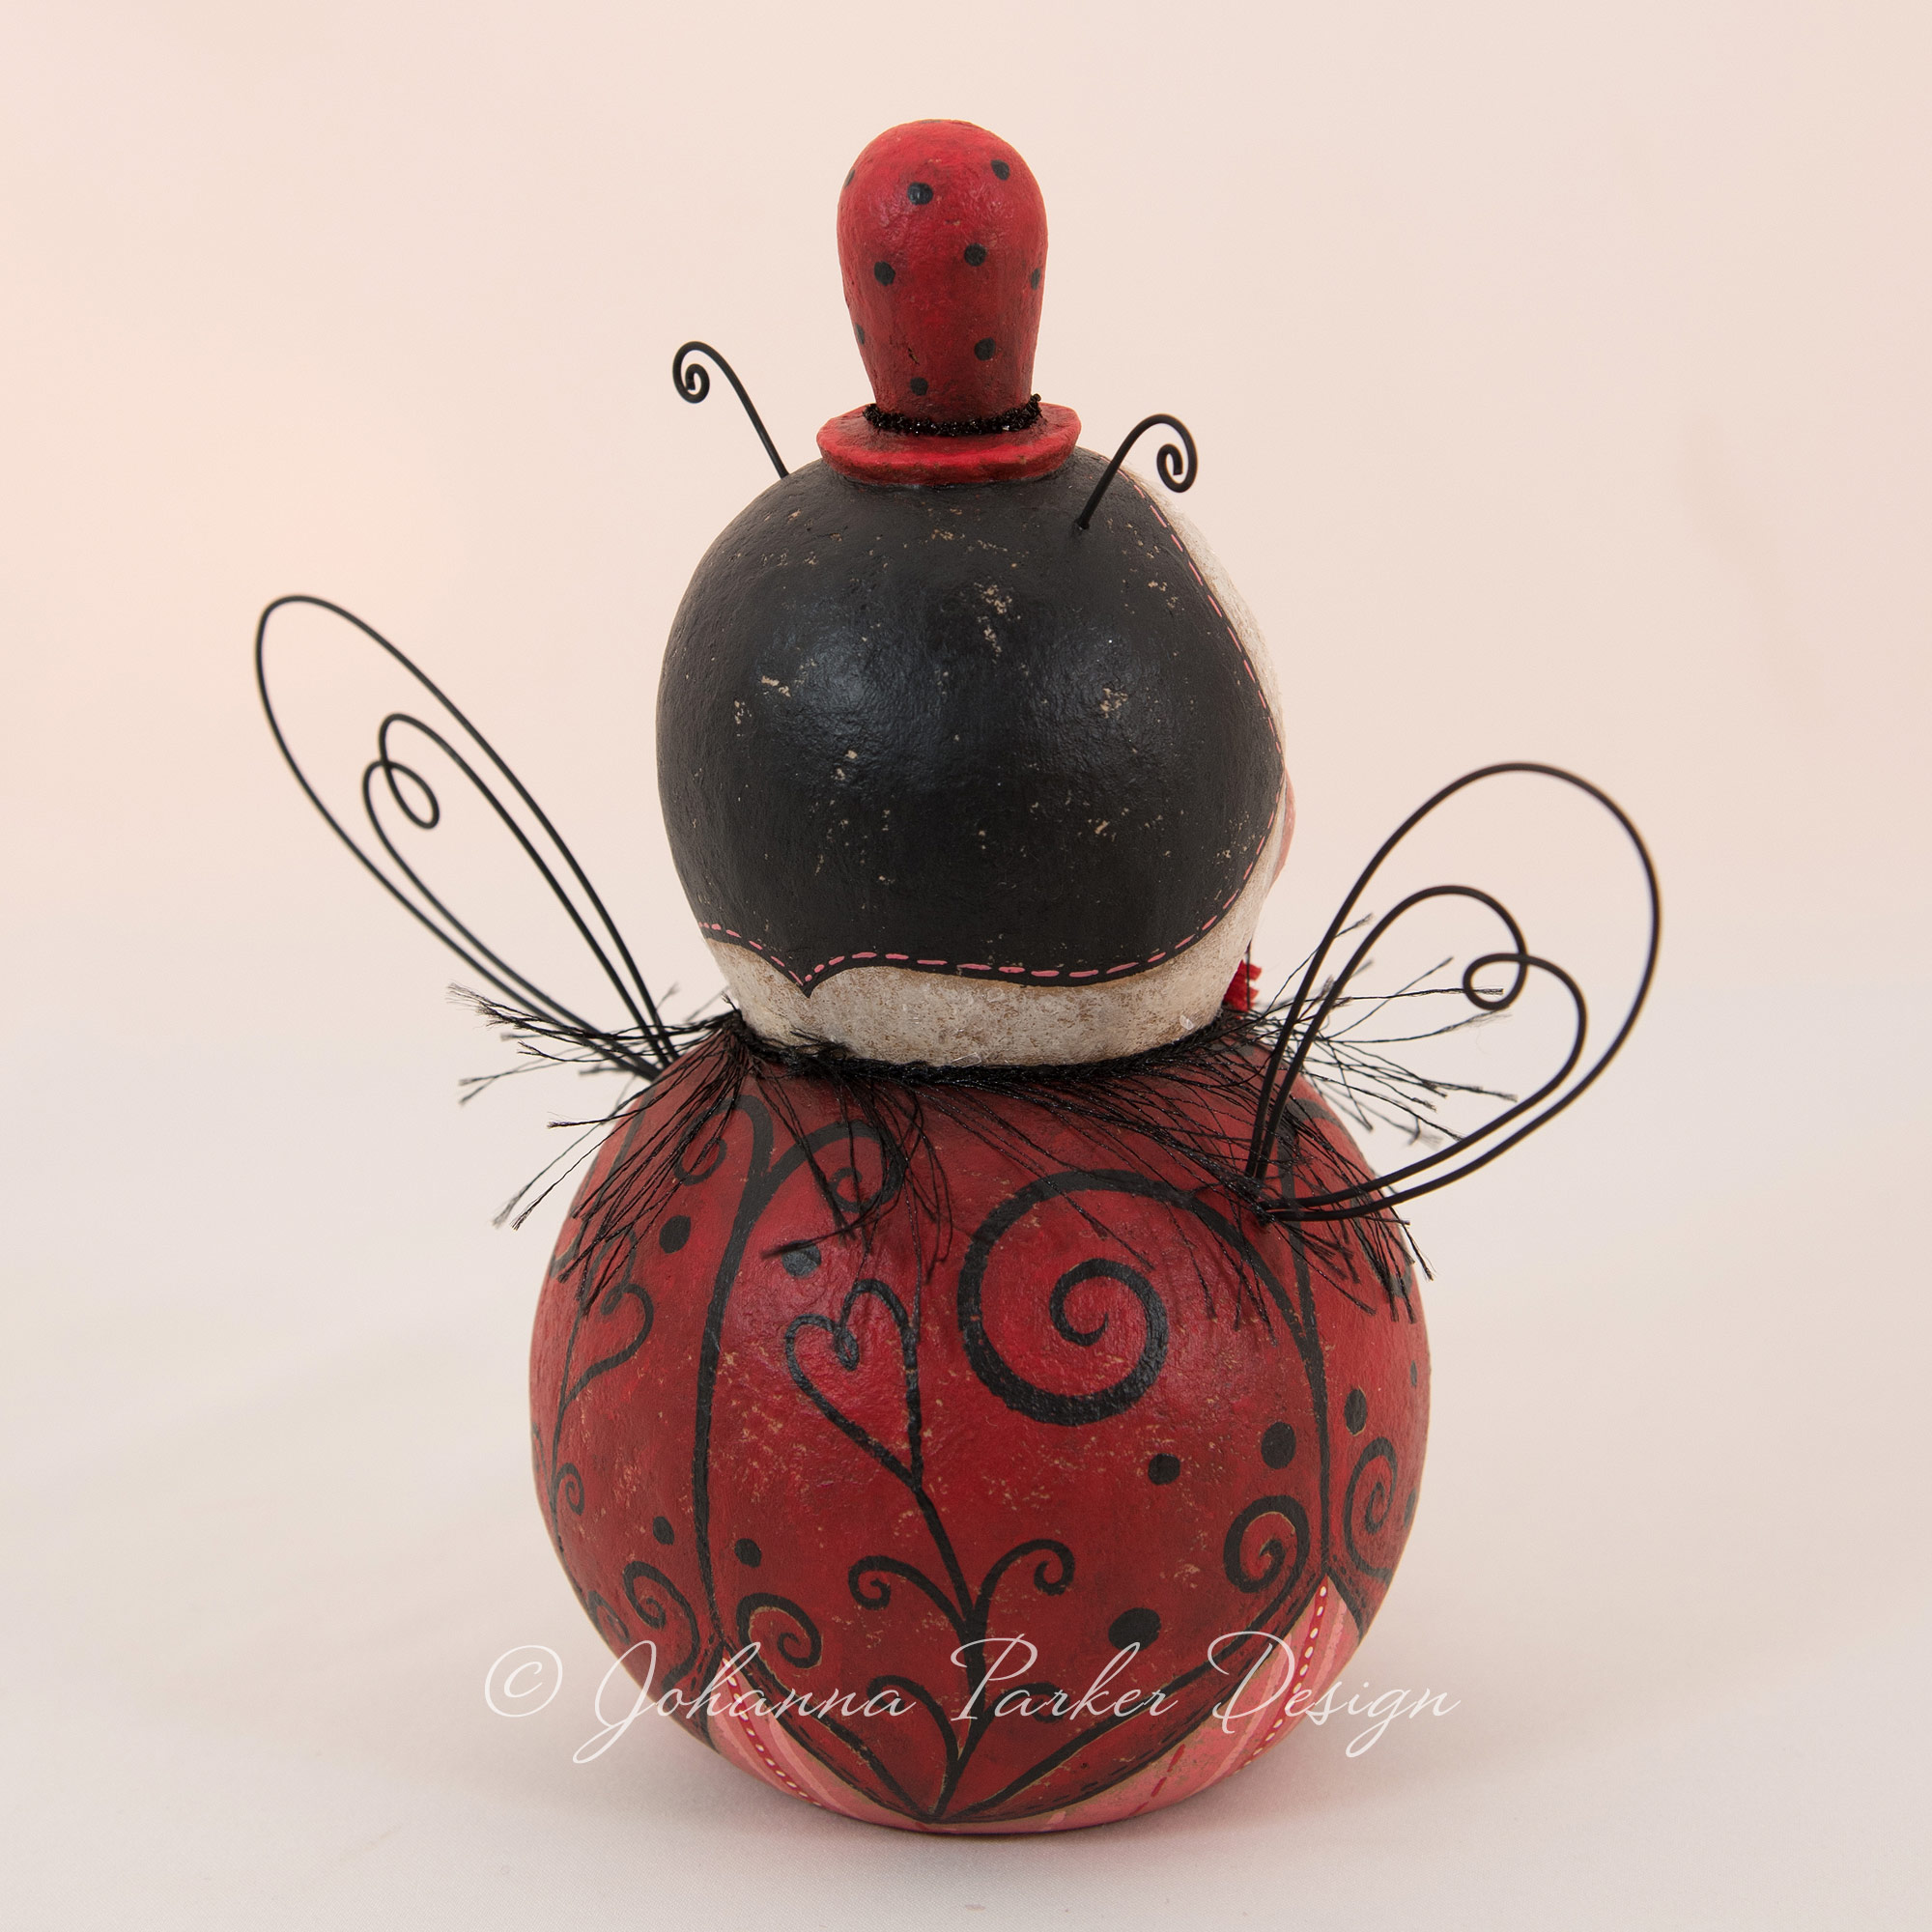 Marty-Heart-Valentine-Love-Bug-F.jpg